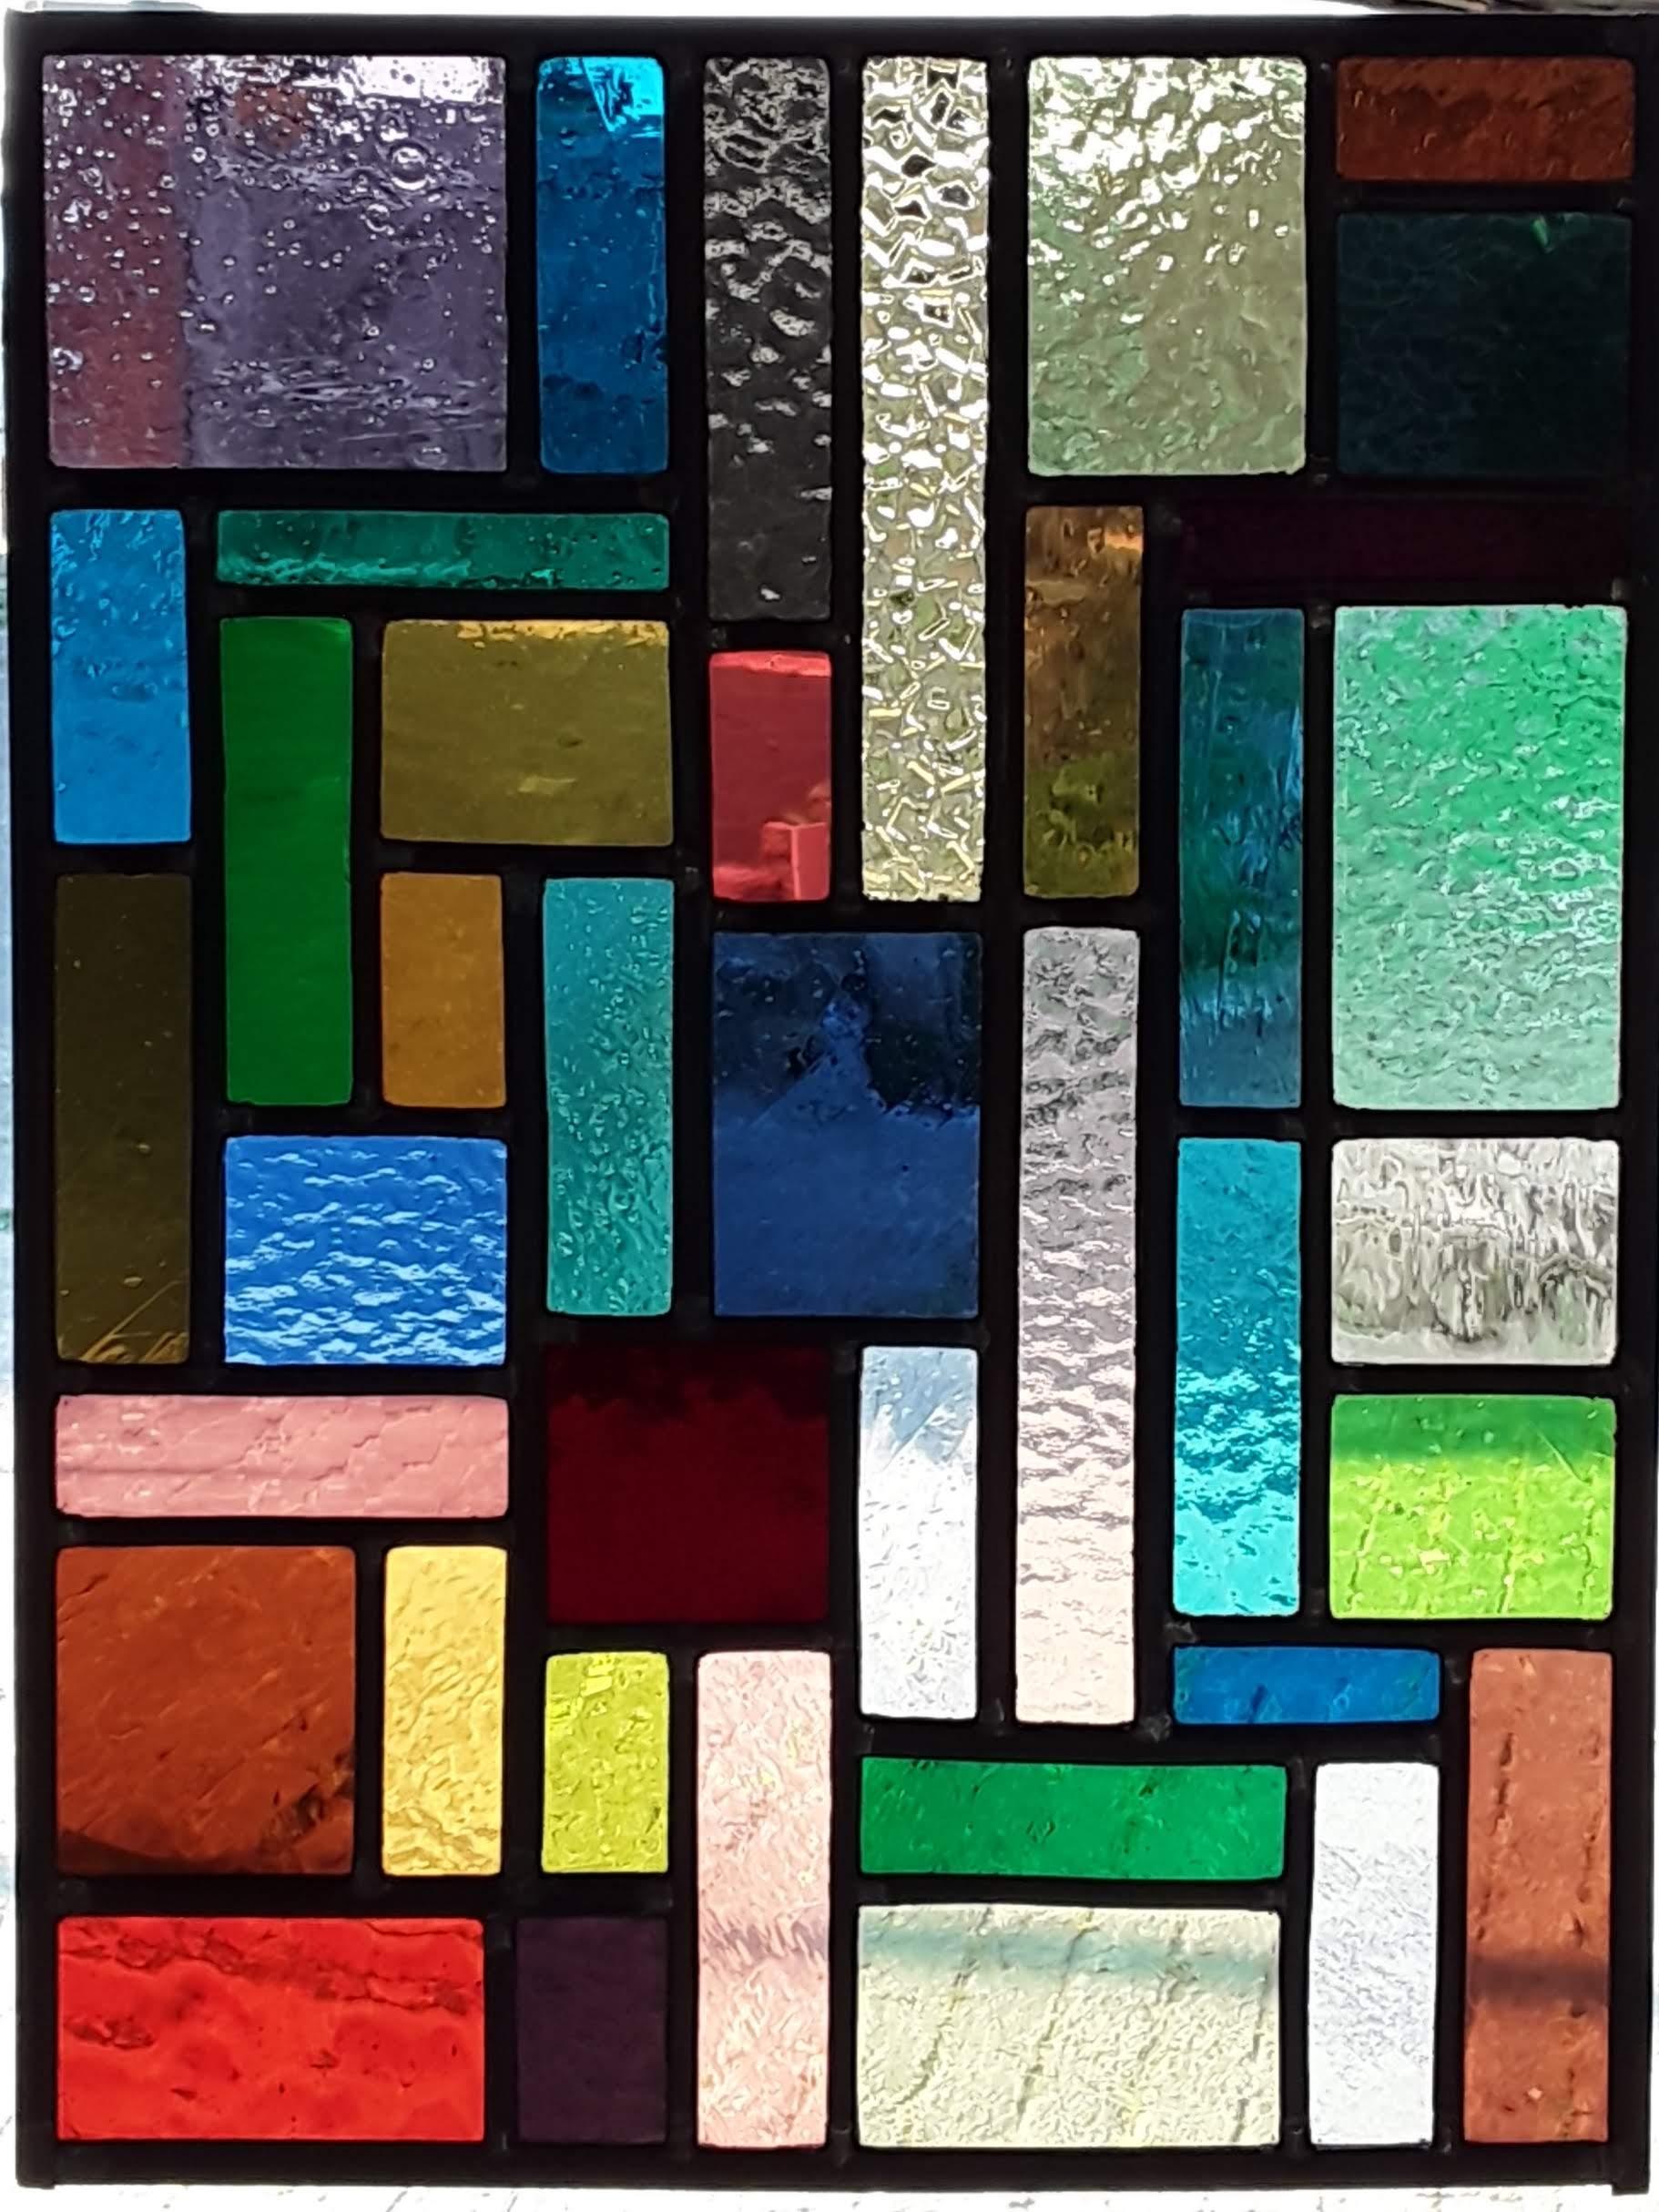 glasraam glas-in-lood kleurrijk glas